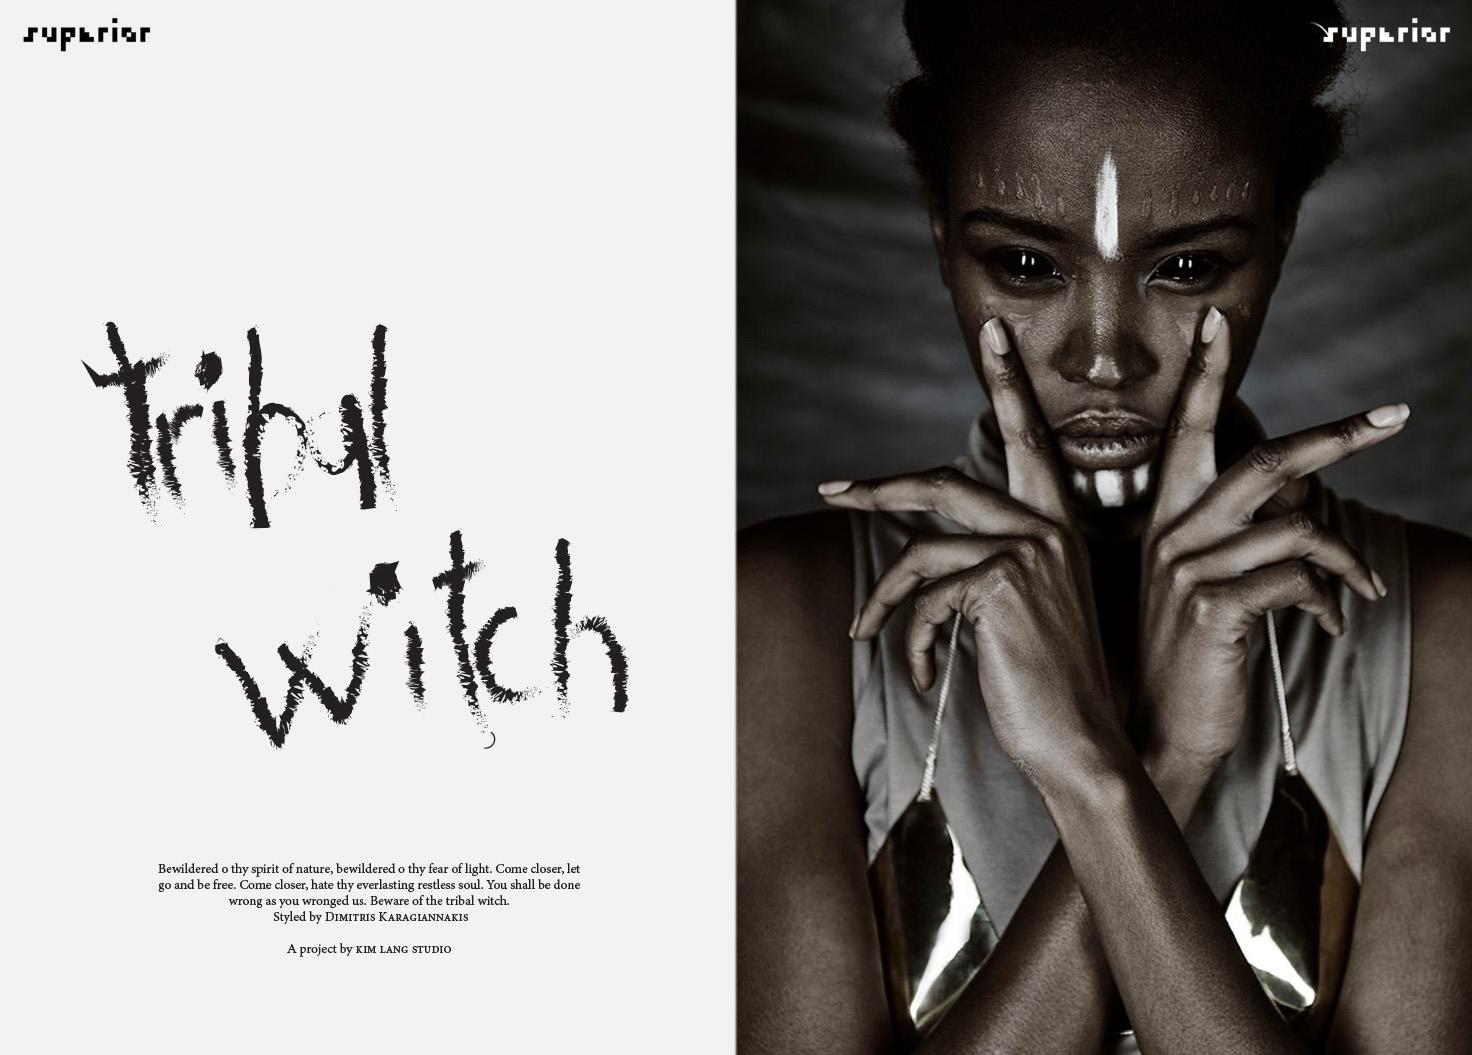 Superior - Tribal Witch_V2.jpg